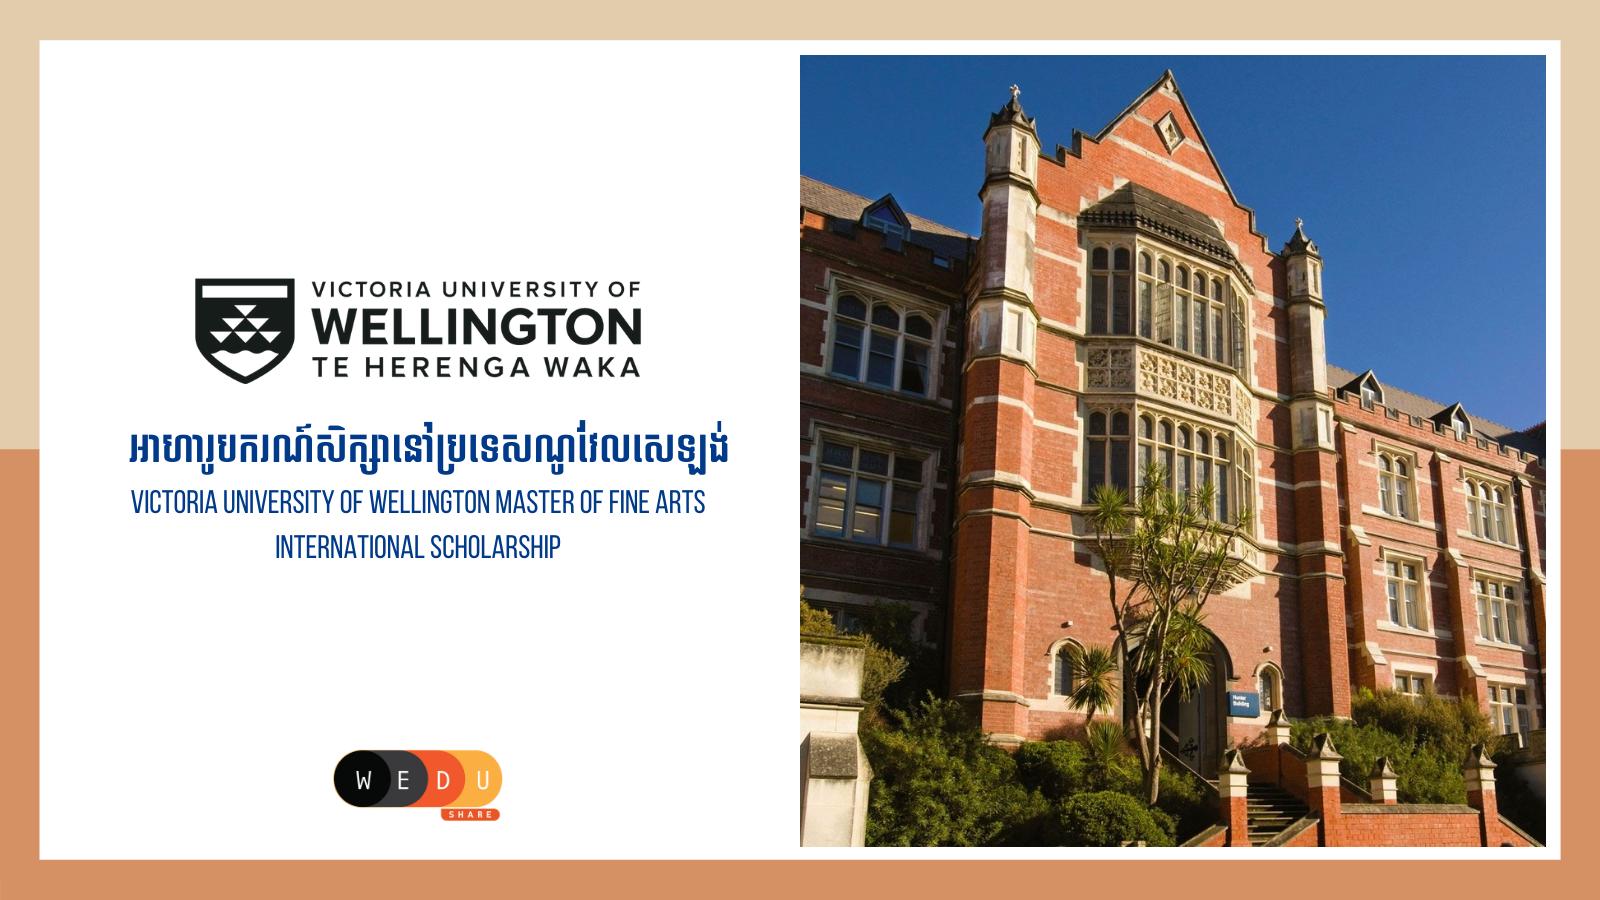 Victoria University Of Wellington Master Of Fine Arts International Scholarship